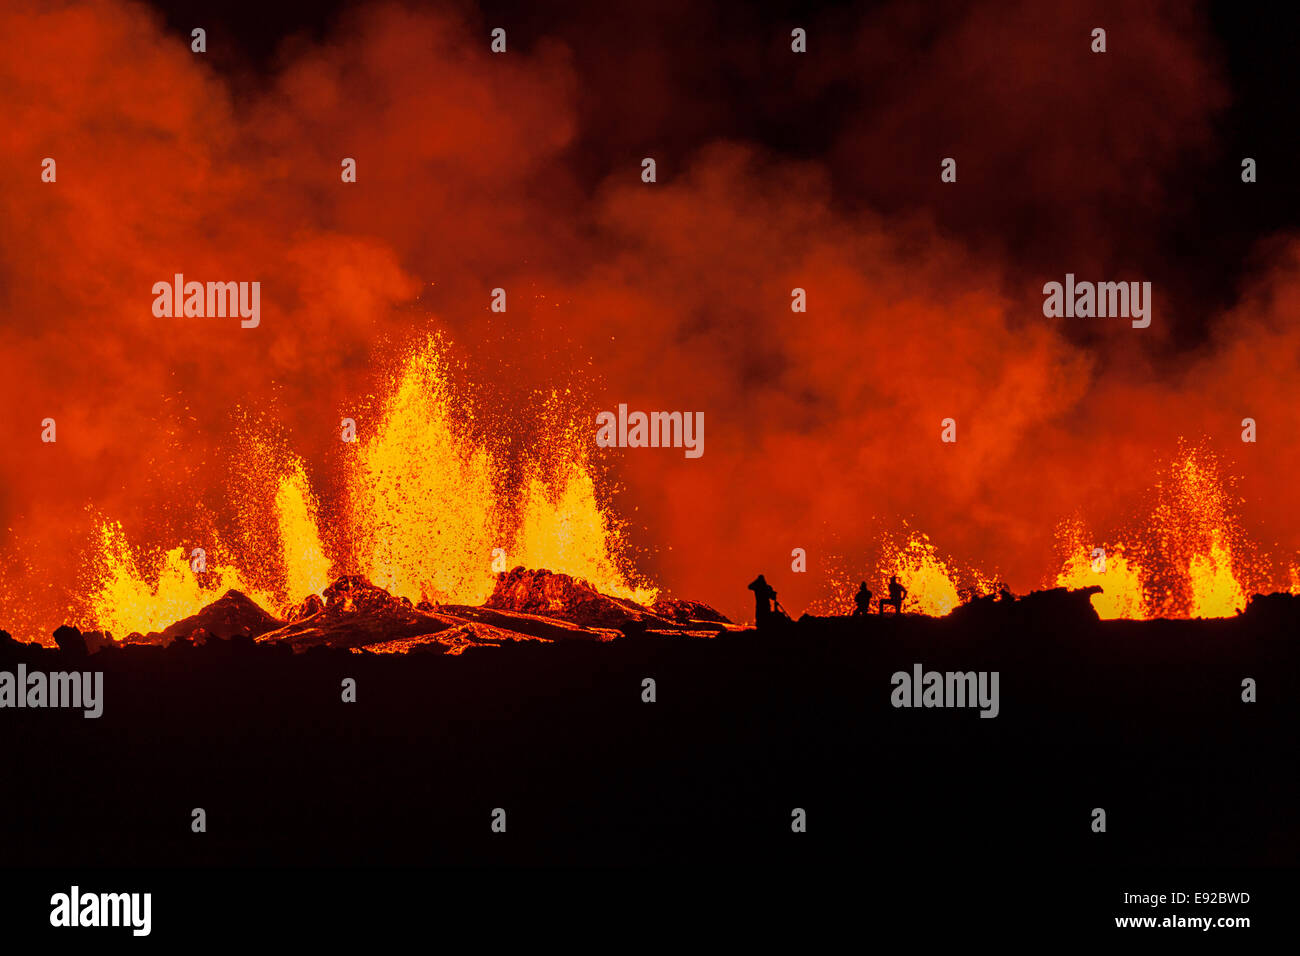 Volcano Eruption Iceland 2014 - Stock Image